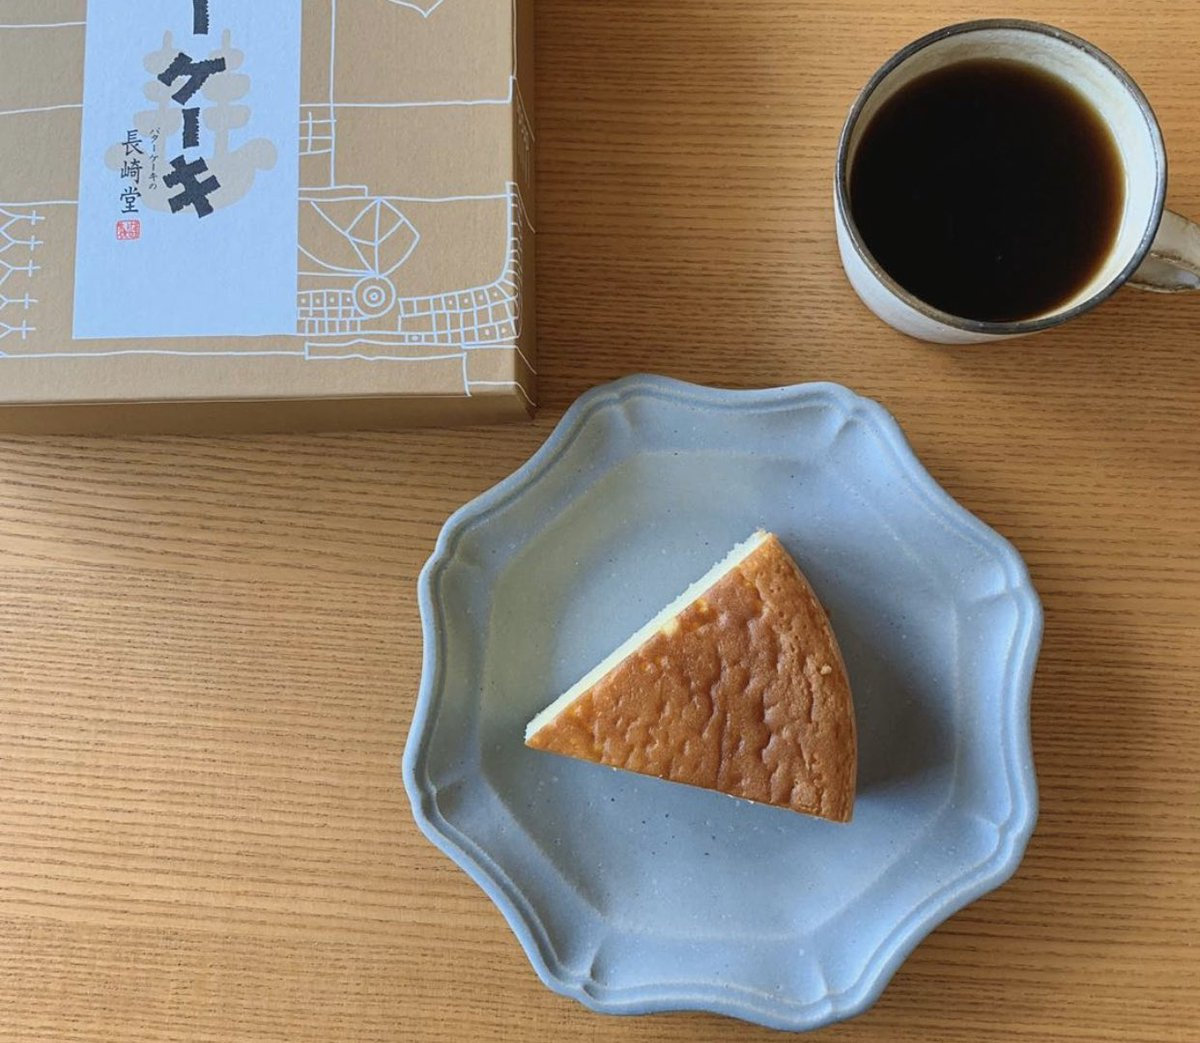 test ツイッターメディア - @rikawa_dare 長崎堂のバターケーキ美味しいですよね https://t.co/l08dx4cIkK